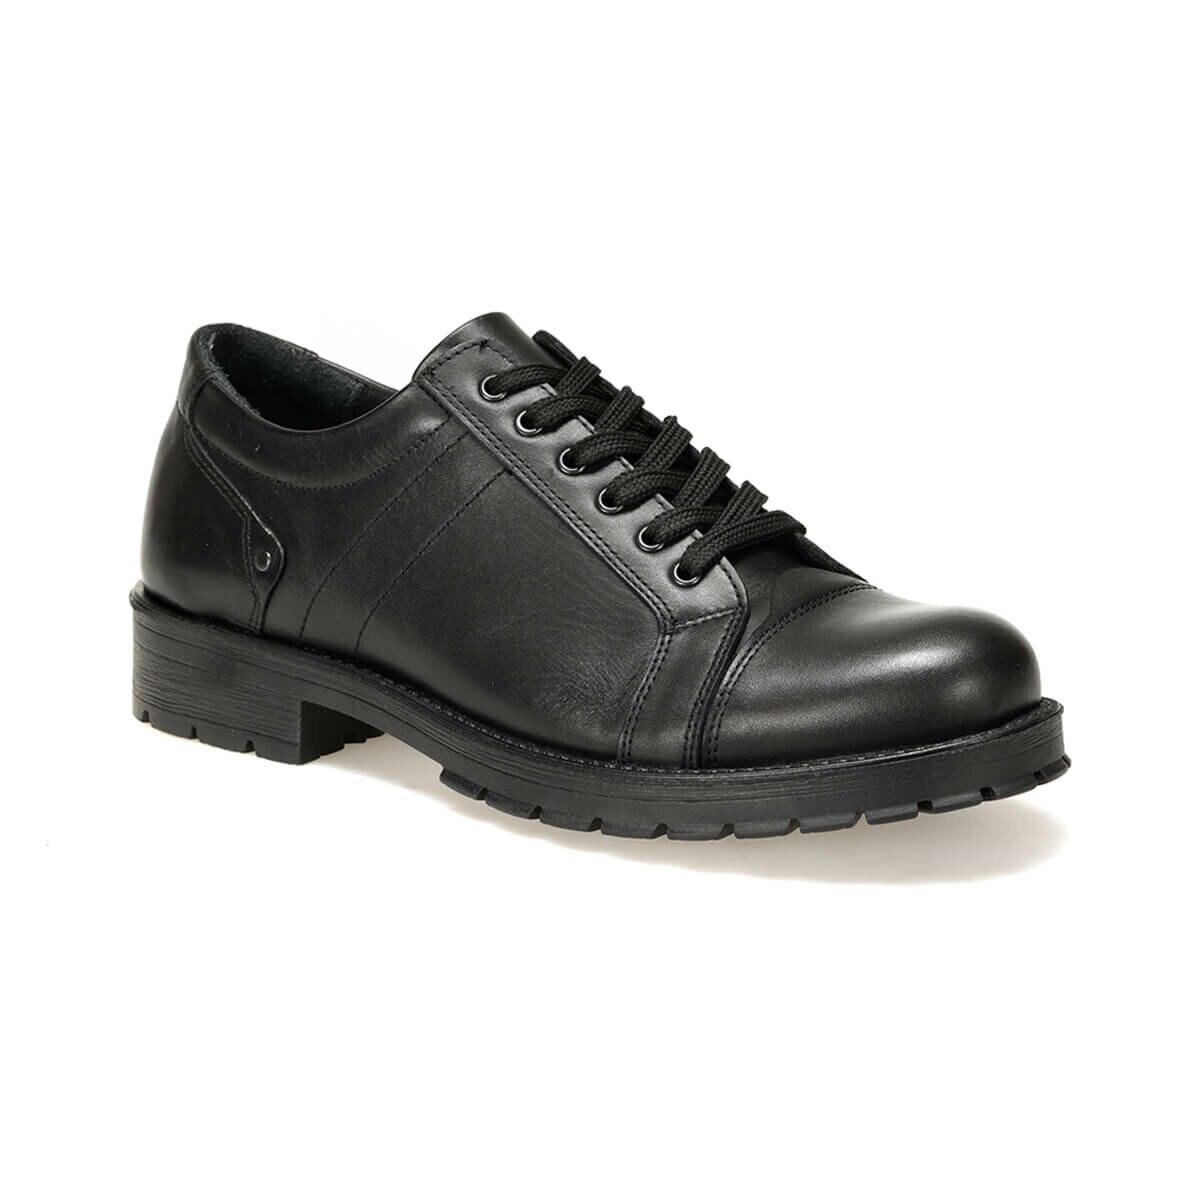 FLO 506 Black Male Shoes Oxide